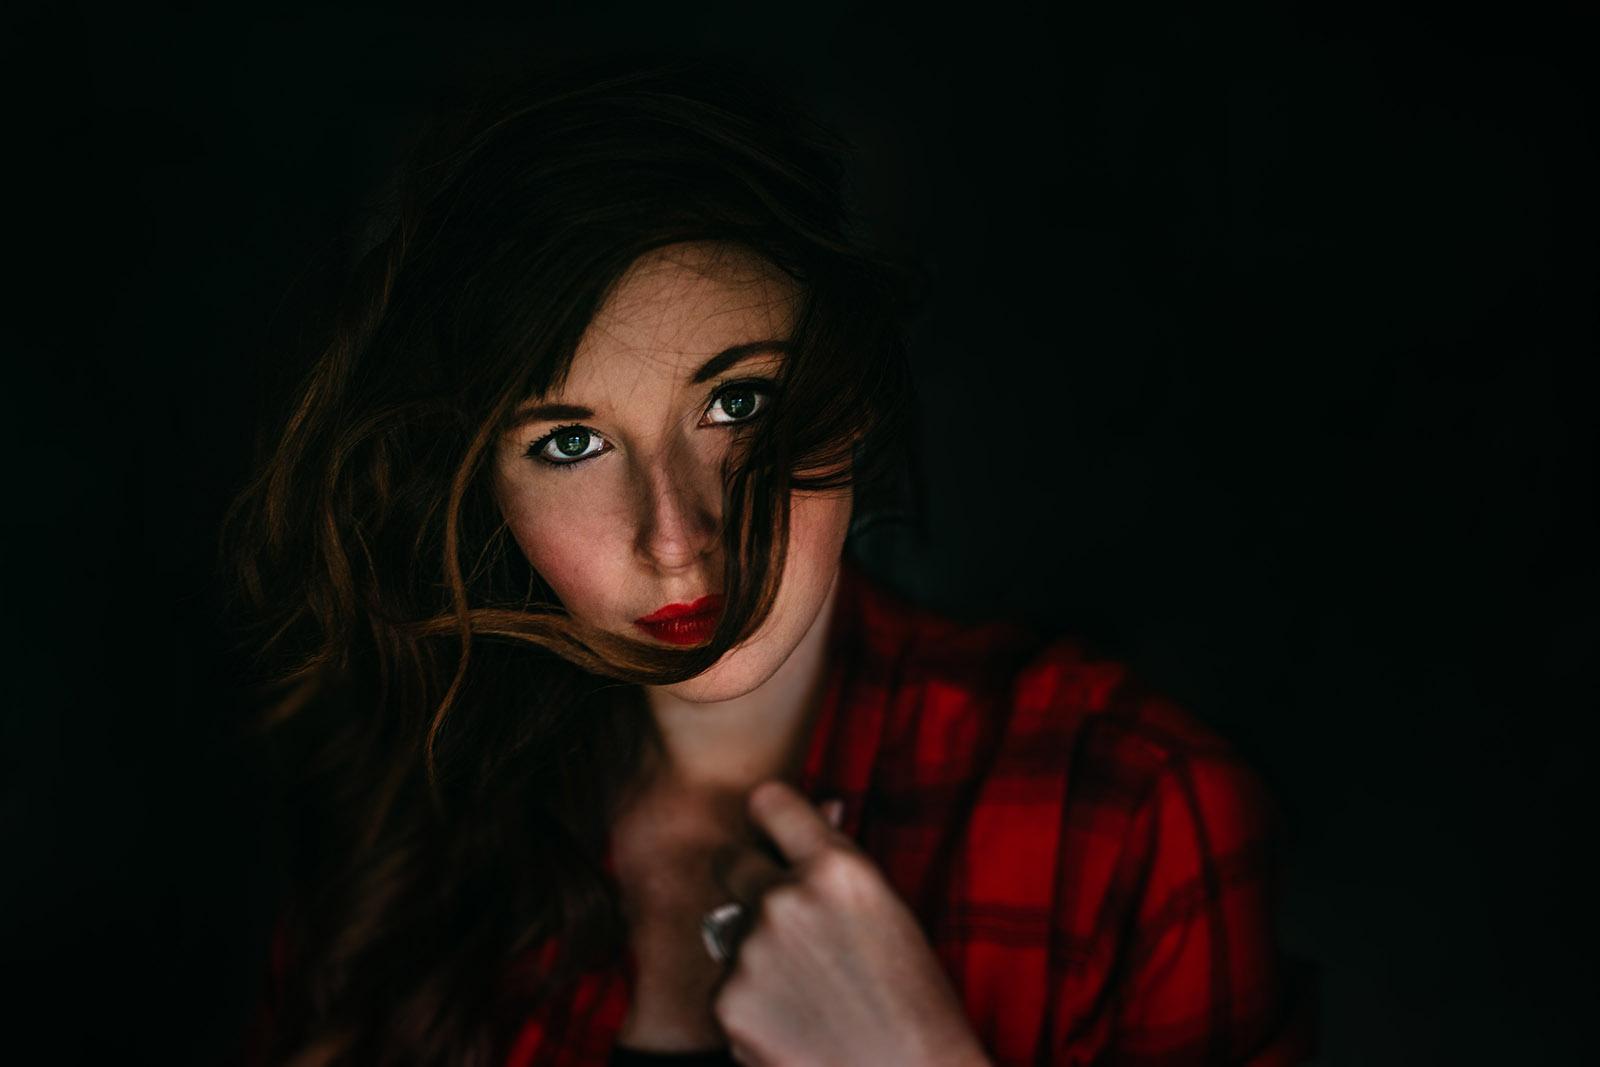 How to take self-portraits